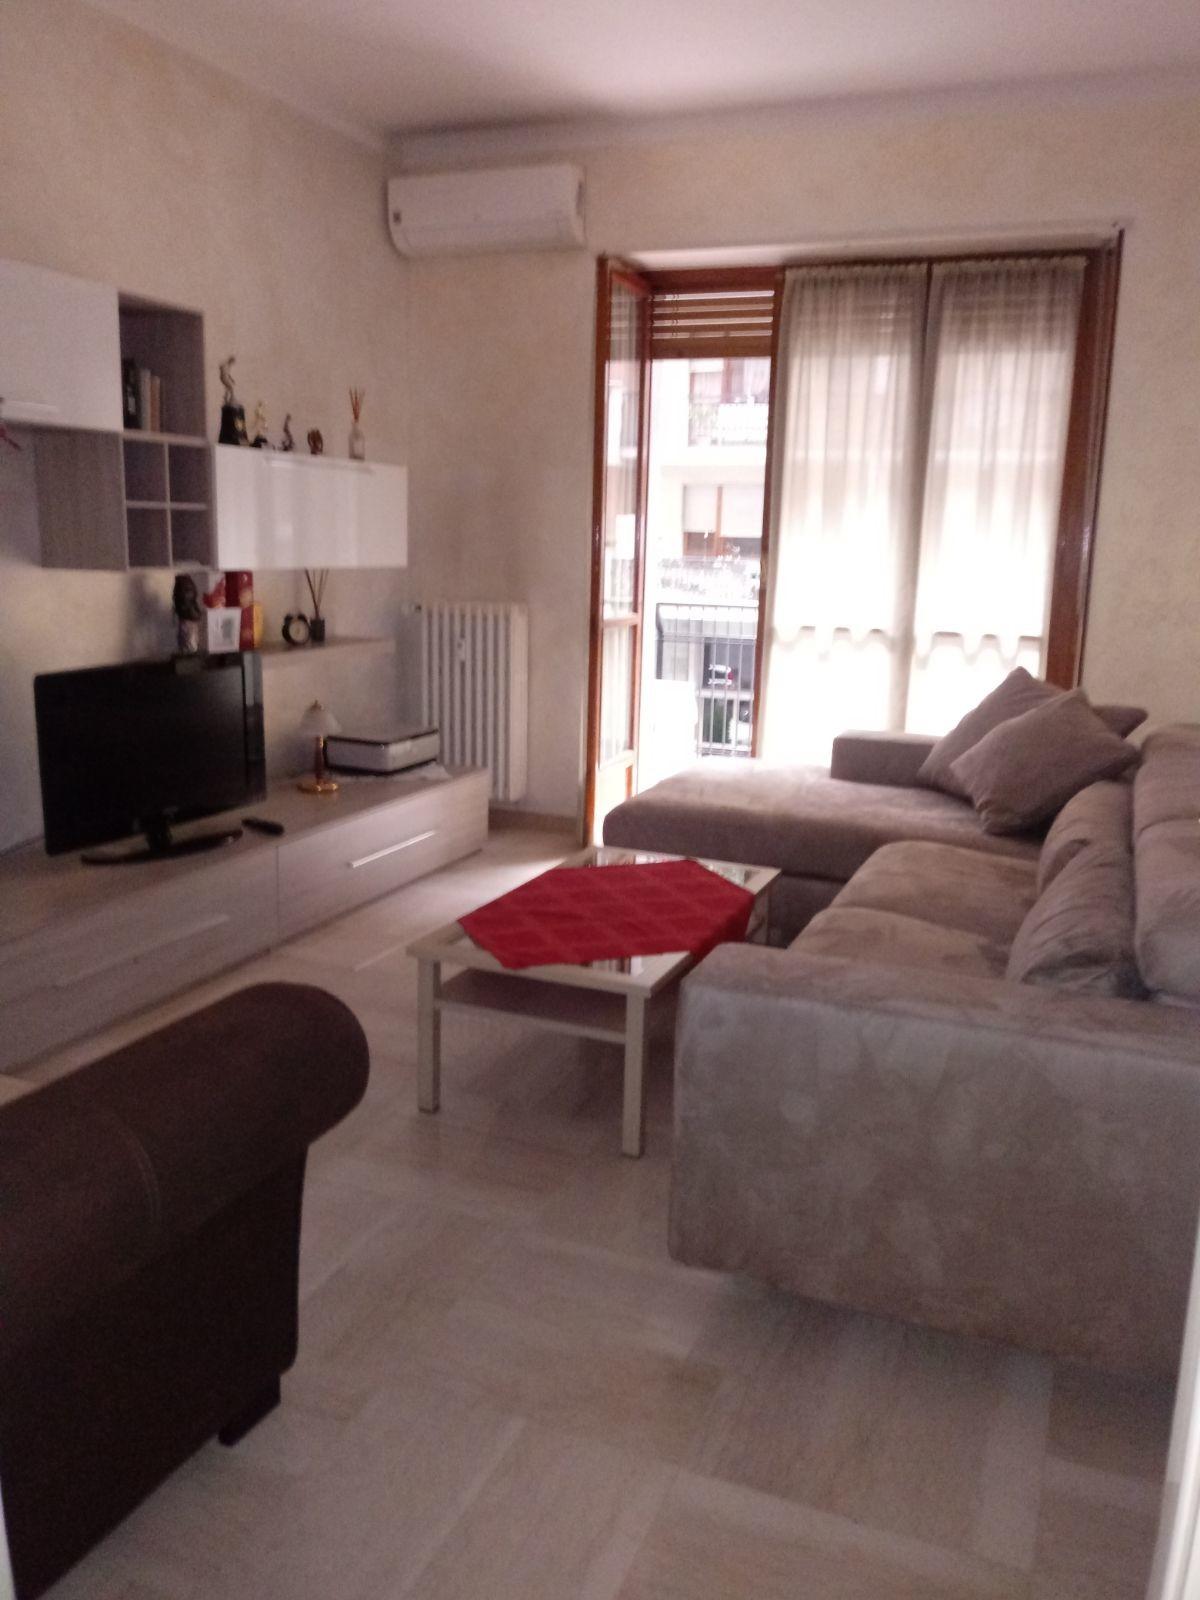 quiet-comfortable-single-room-e16a484deef8f73850826fe1452baa23